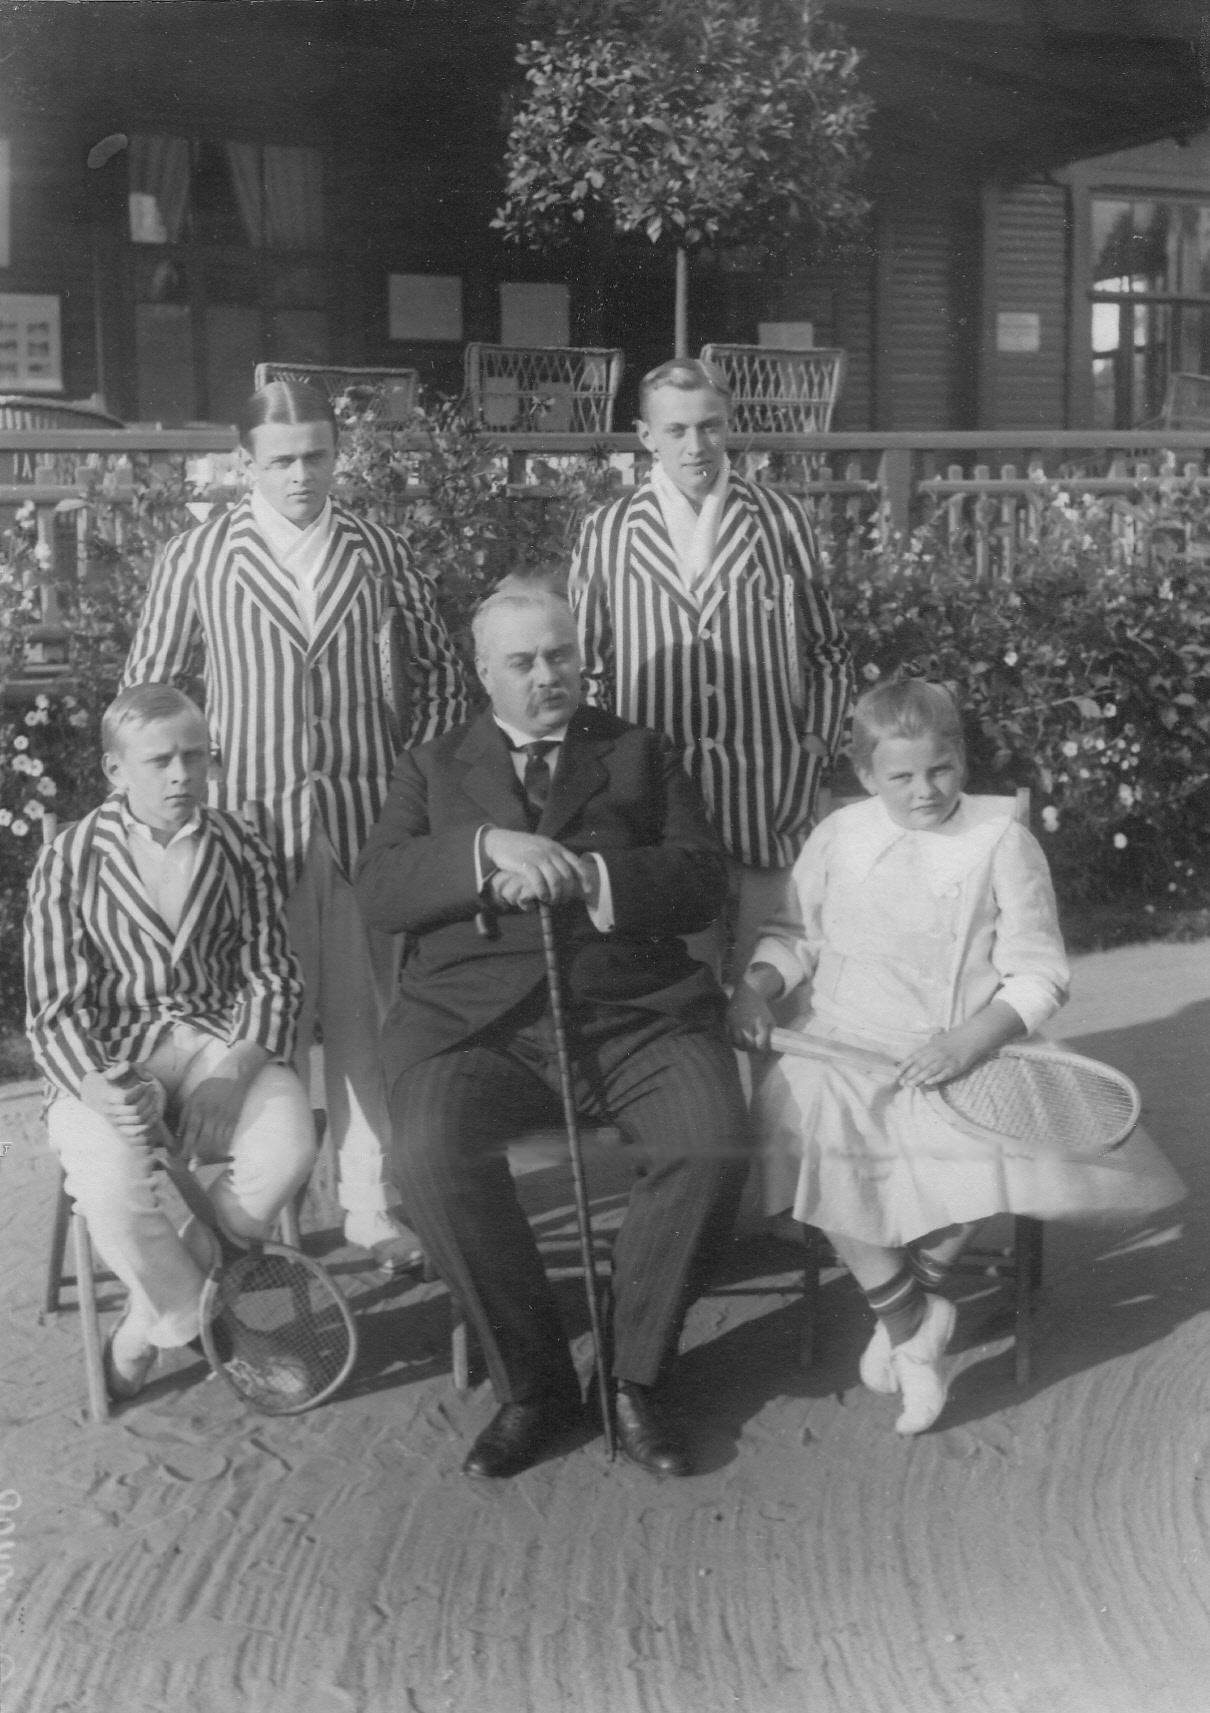 10. Председатель Лаун-теннис клуба - А. Д. Макферсон с детьми (стоят) - Роберт Артурович Макферсон III (слева) и Артур Артурович Макферсон II